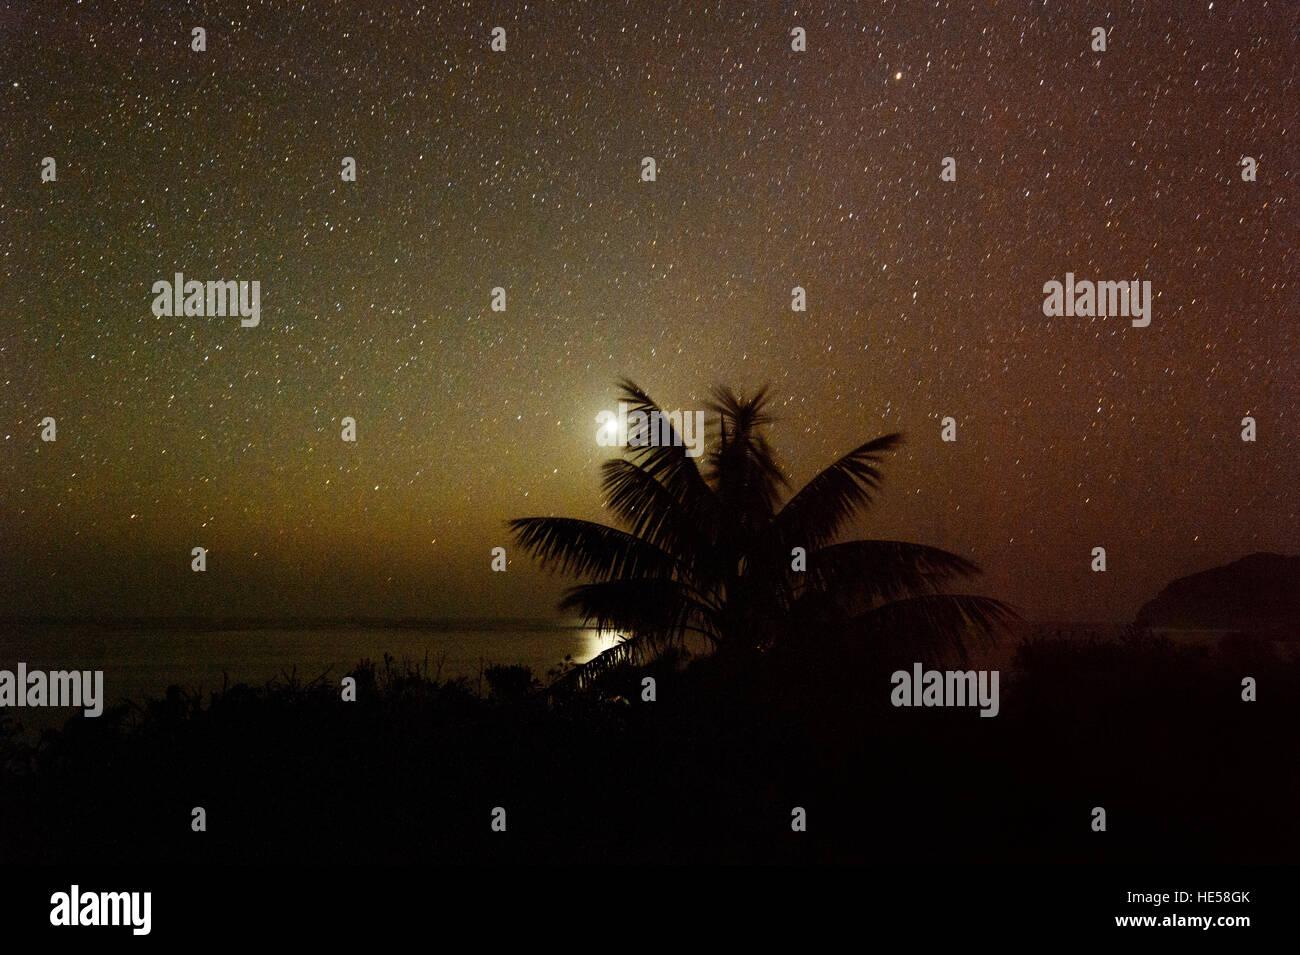 Mondhellen Nachthimmel auf Lord Howe Island, New South Wales, NSW, Australien. Stockbild